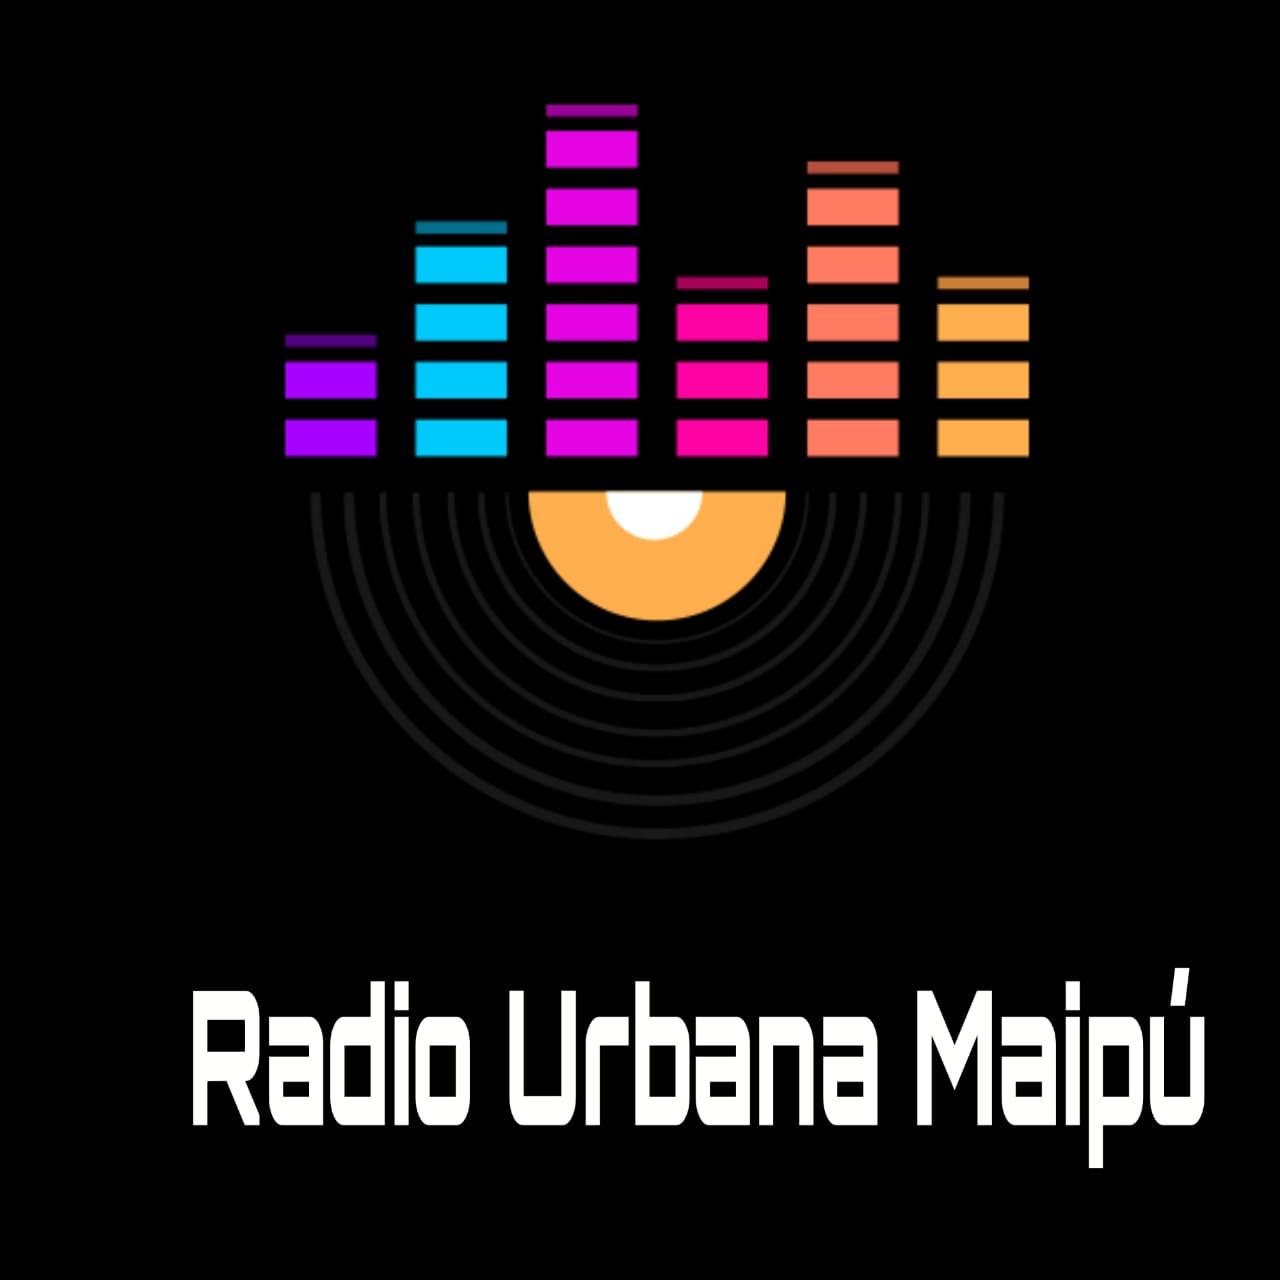 Radio Urbana Maipu